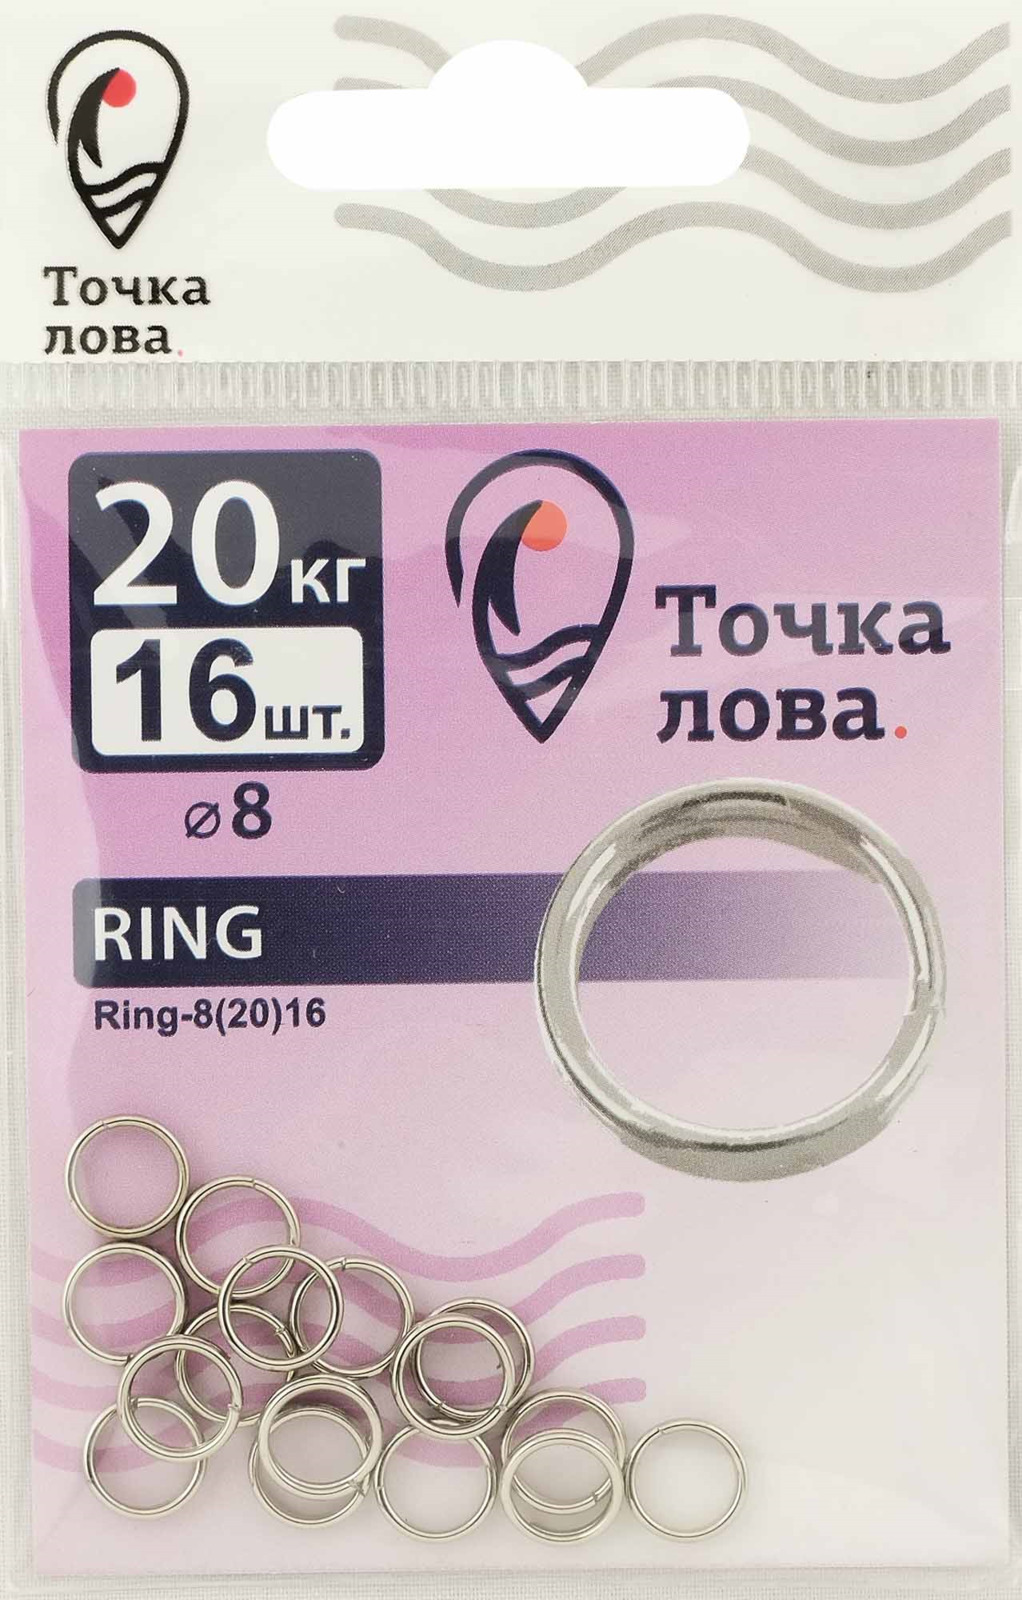 Аксессуар для рыбалки Точка Лова Заводное кольцо, Ring-8(20), 16 шт